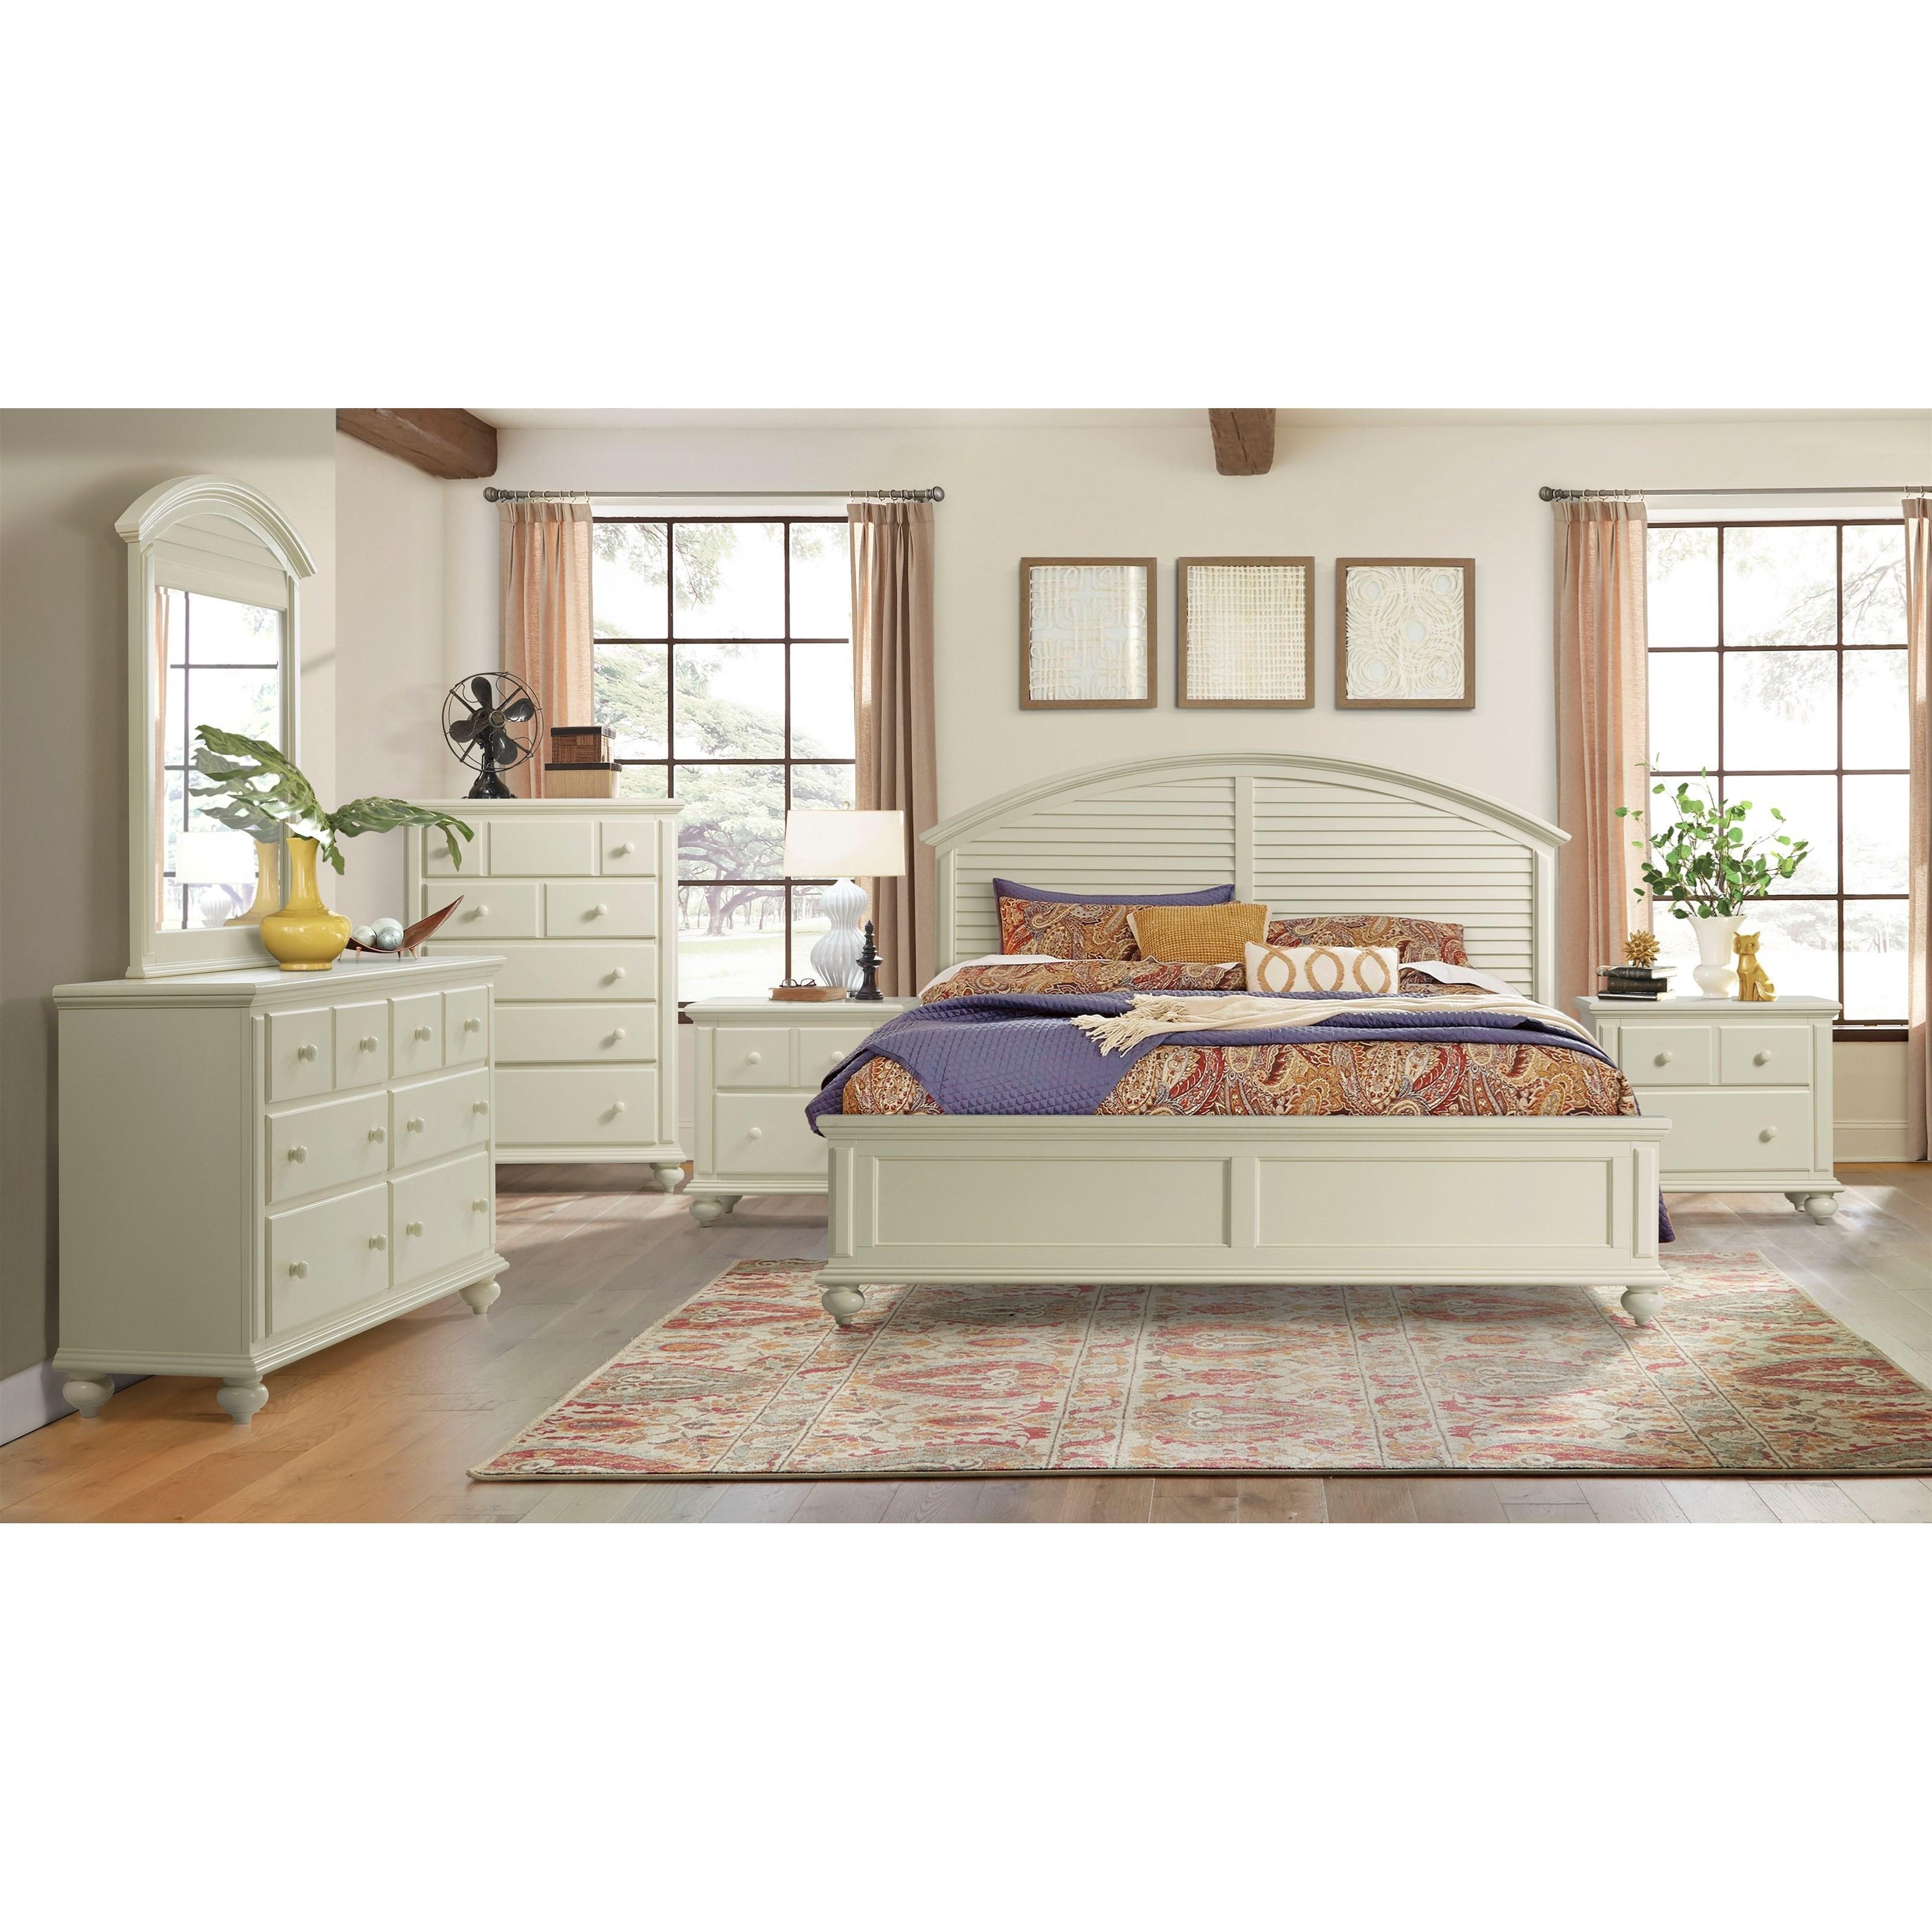 Coastal Cottage Queen Bedroom Group by Stillwater Furniture at Baer's Furniture